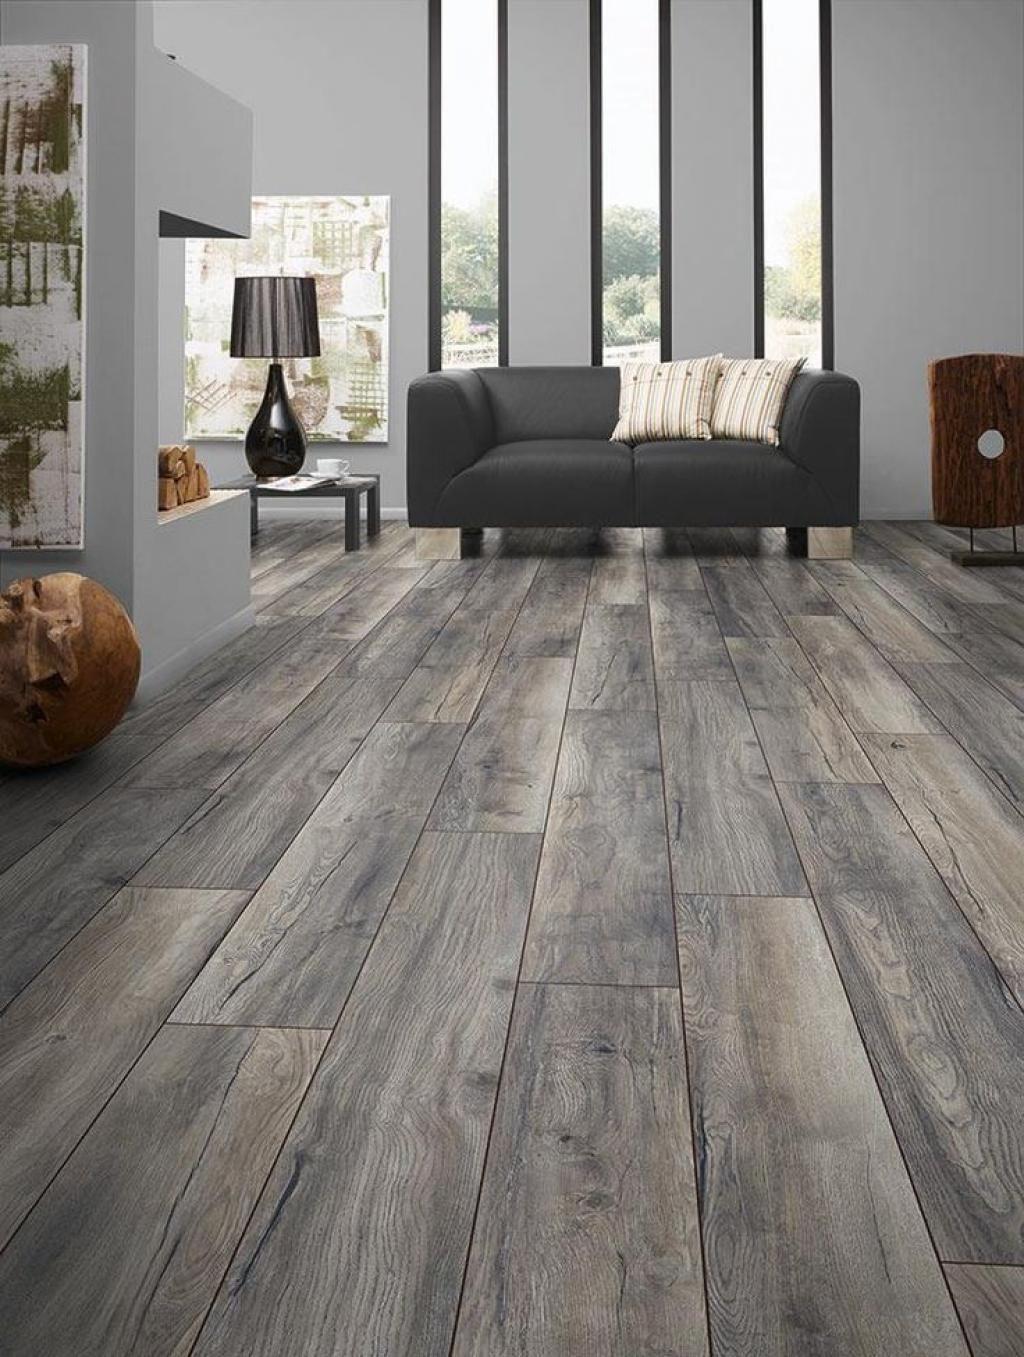 Laminate flooring ideas minimalist-grey-laminate-flooring-seating-area VPIKOJJ